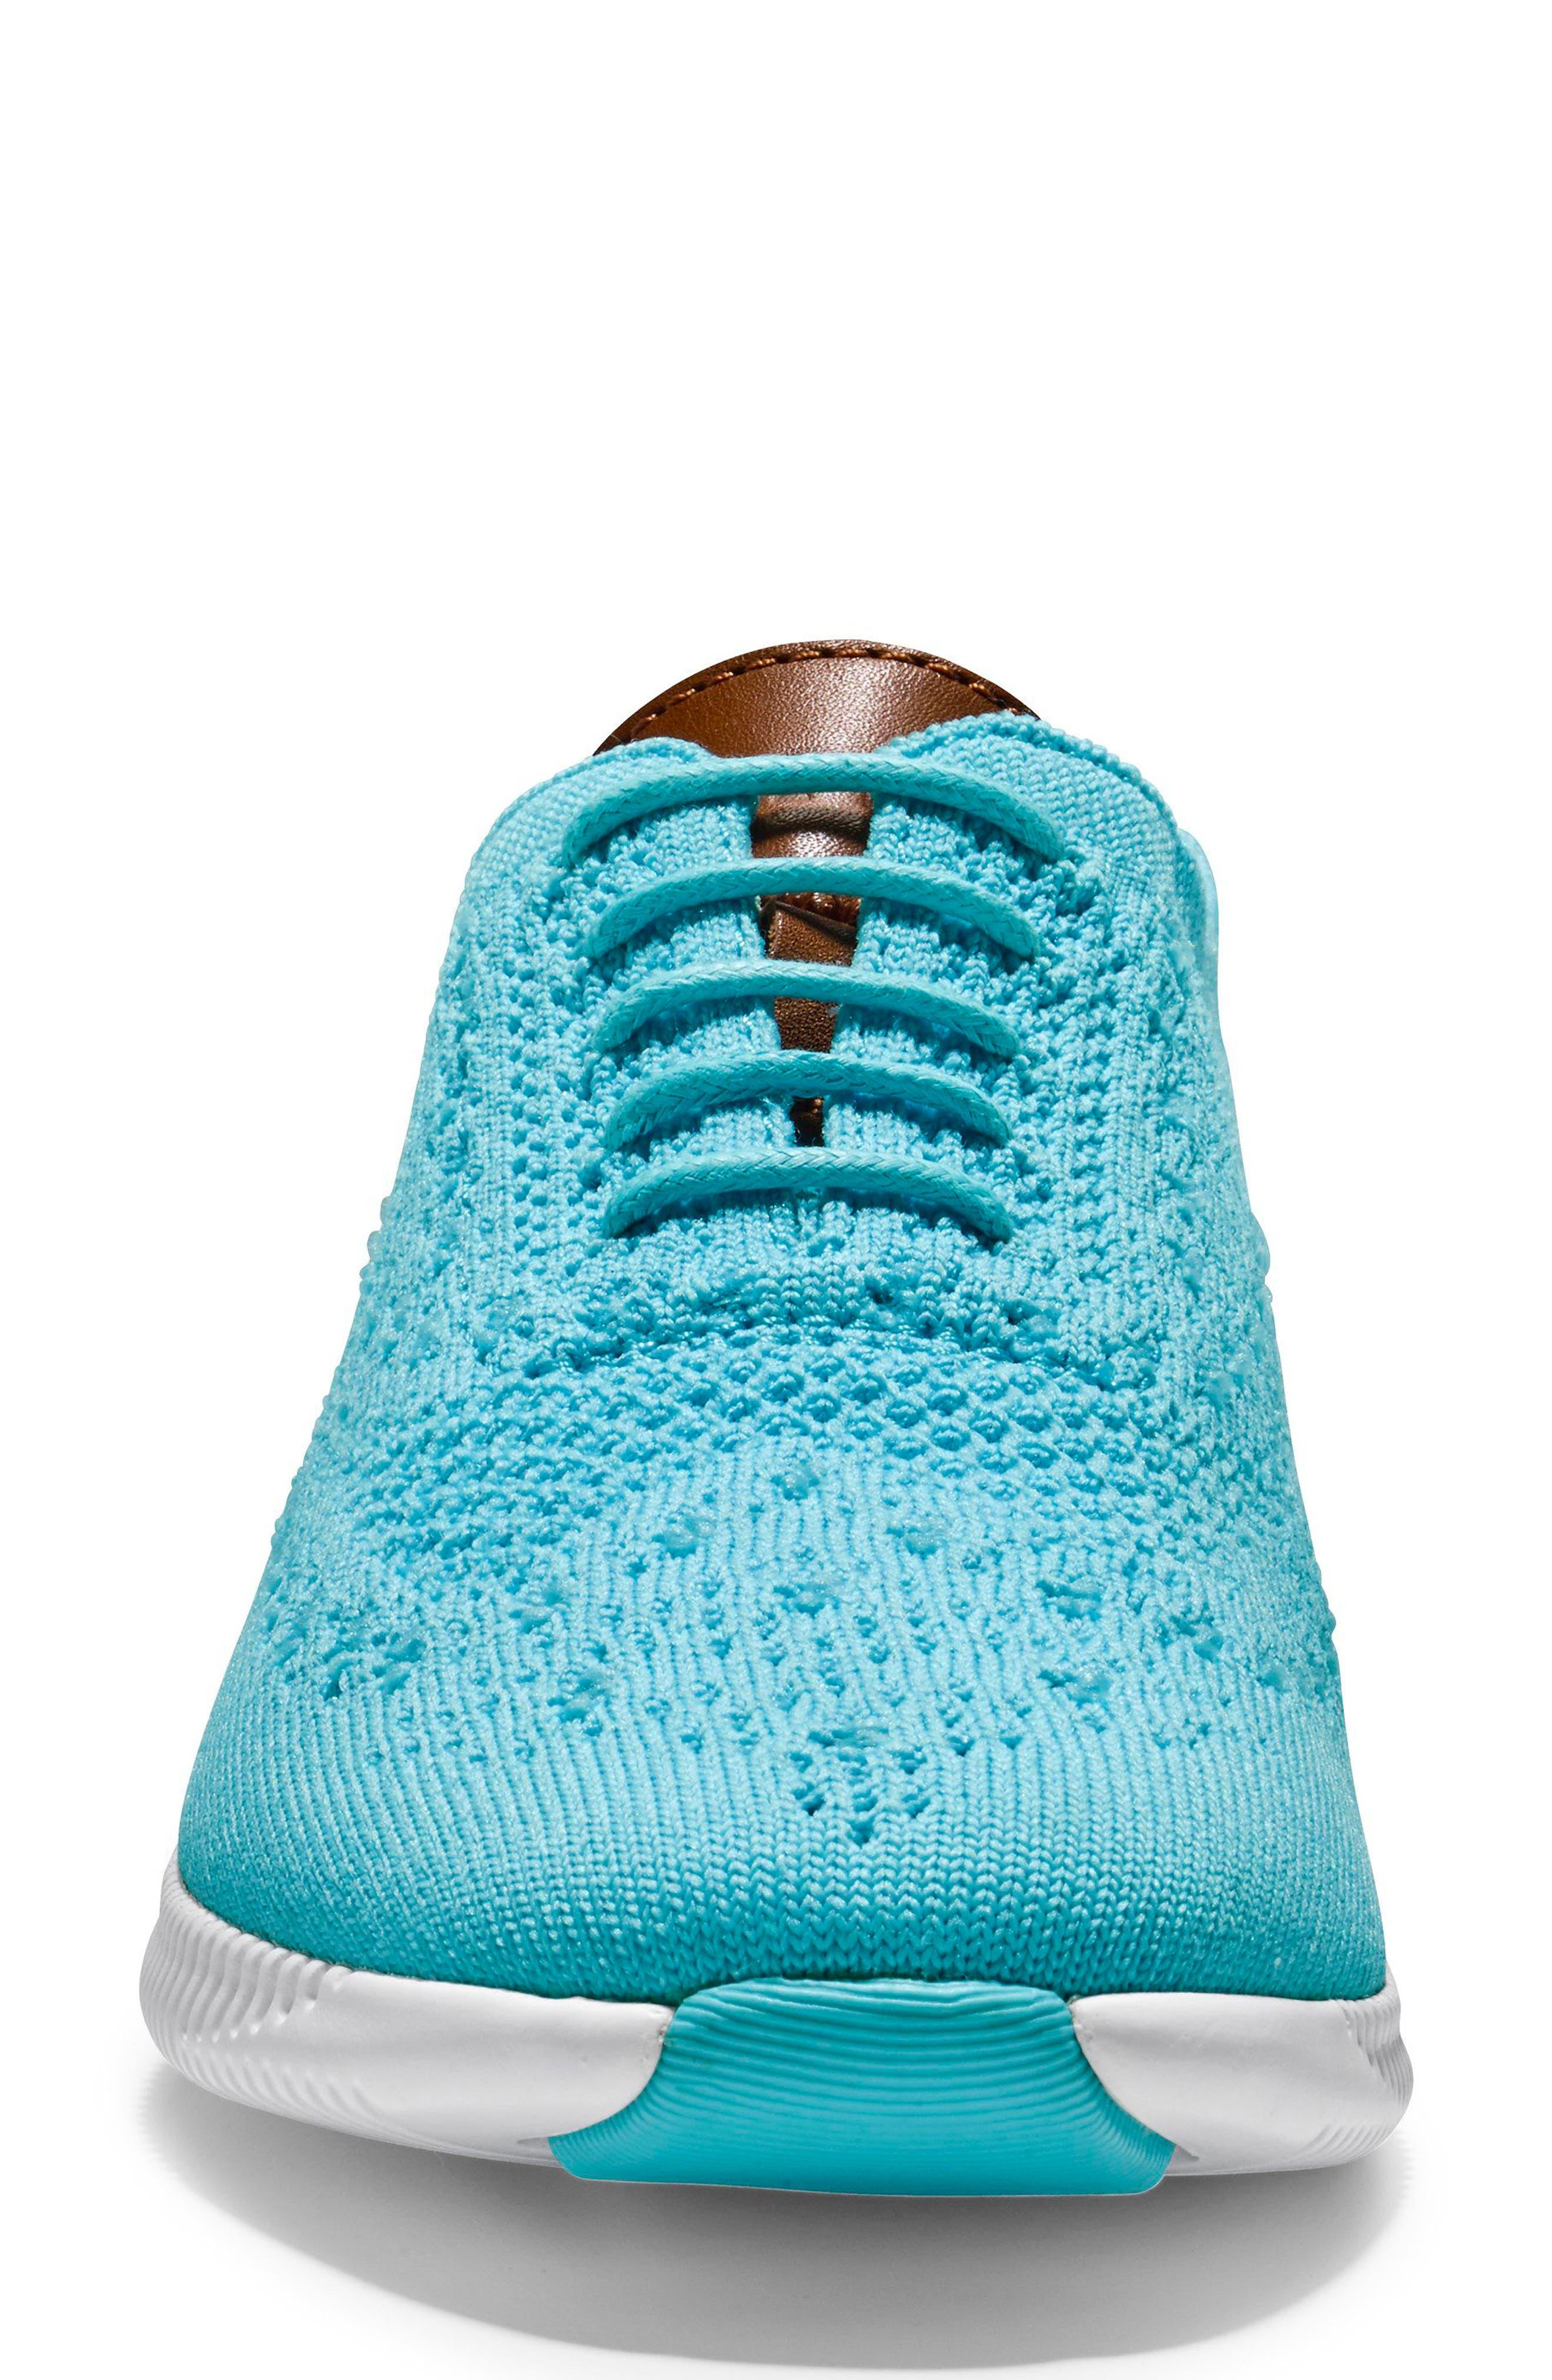 2.ZERØGRAND Stitchlite Wingtip Sneaker,                             Alternate thumbnail 3, color,                             Bluefish Fabric